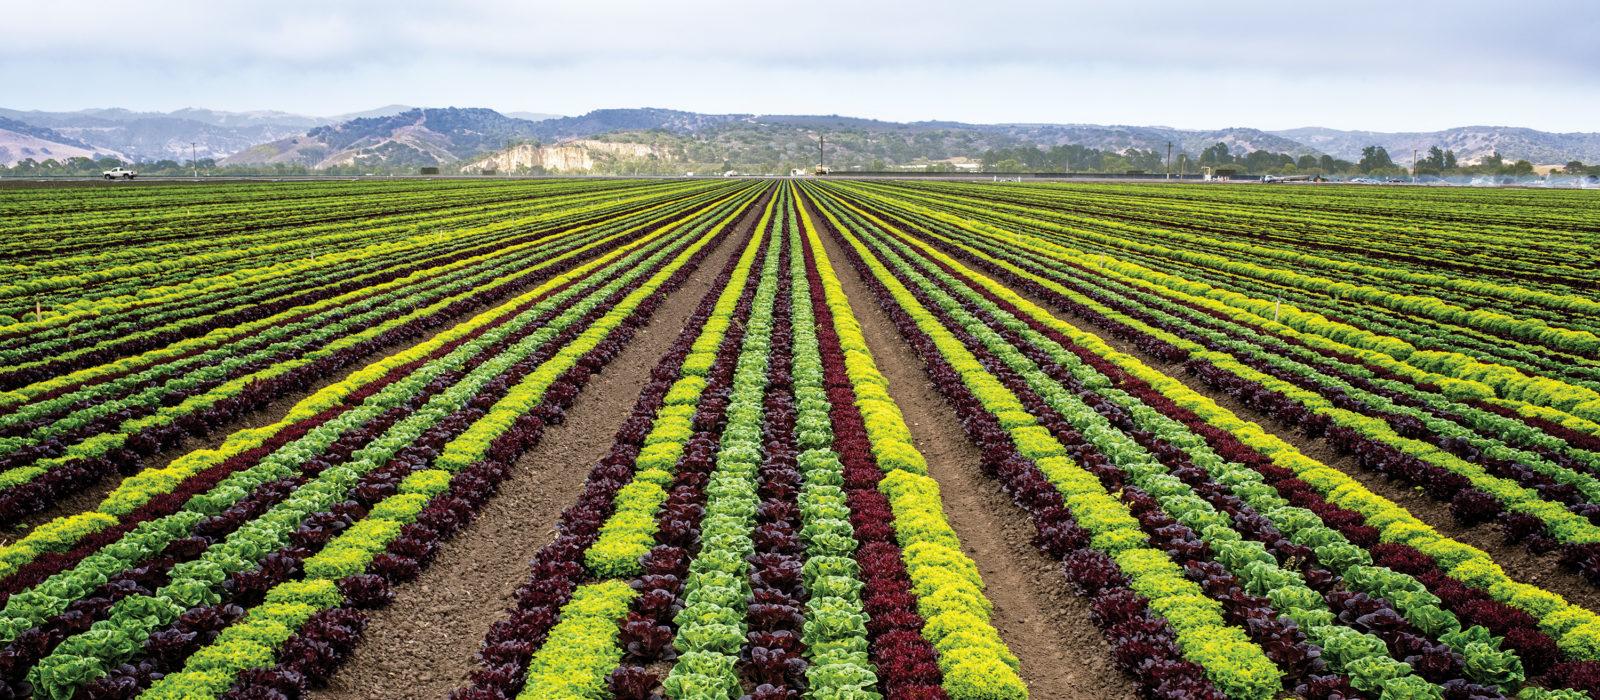 Landscape shot of row crops